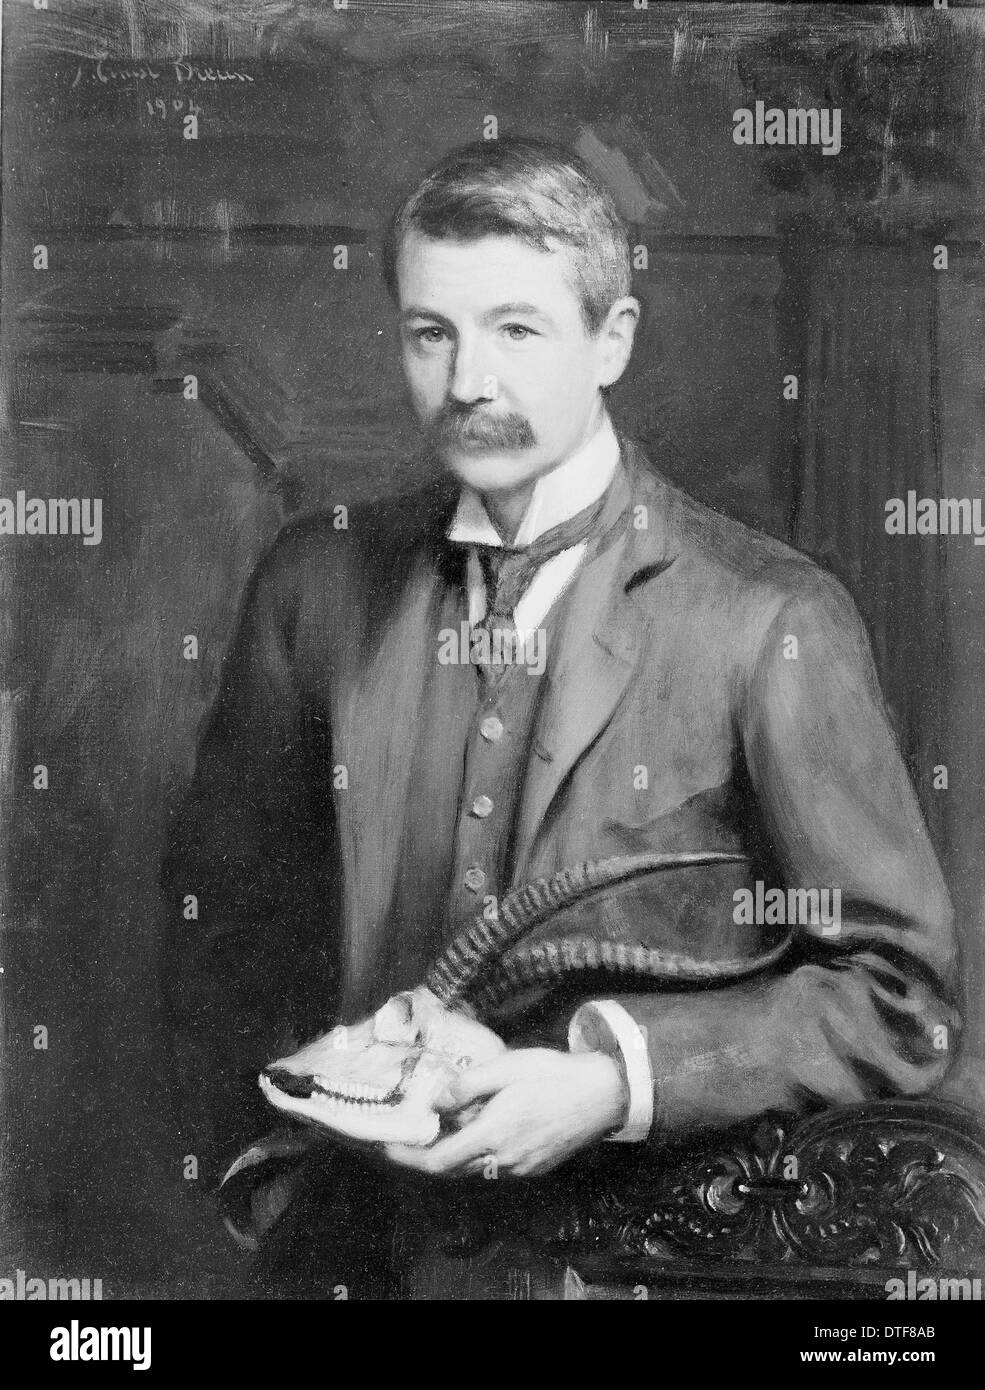 Michael Rogers Oldfield Thomas (1858-1929) - Stock Image